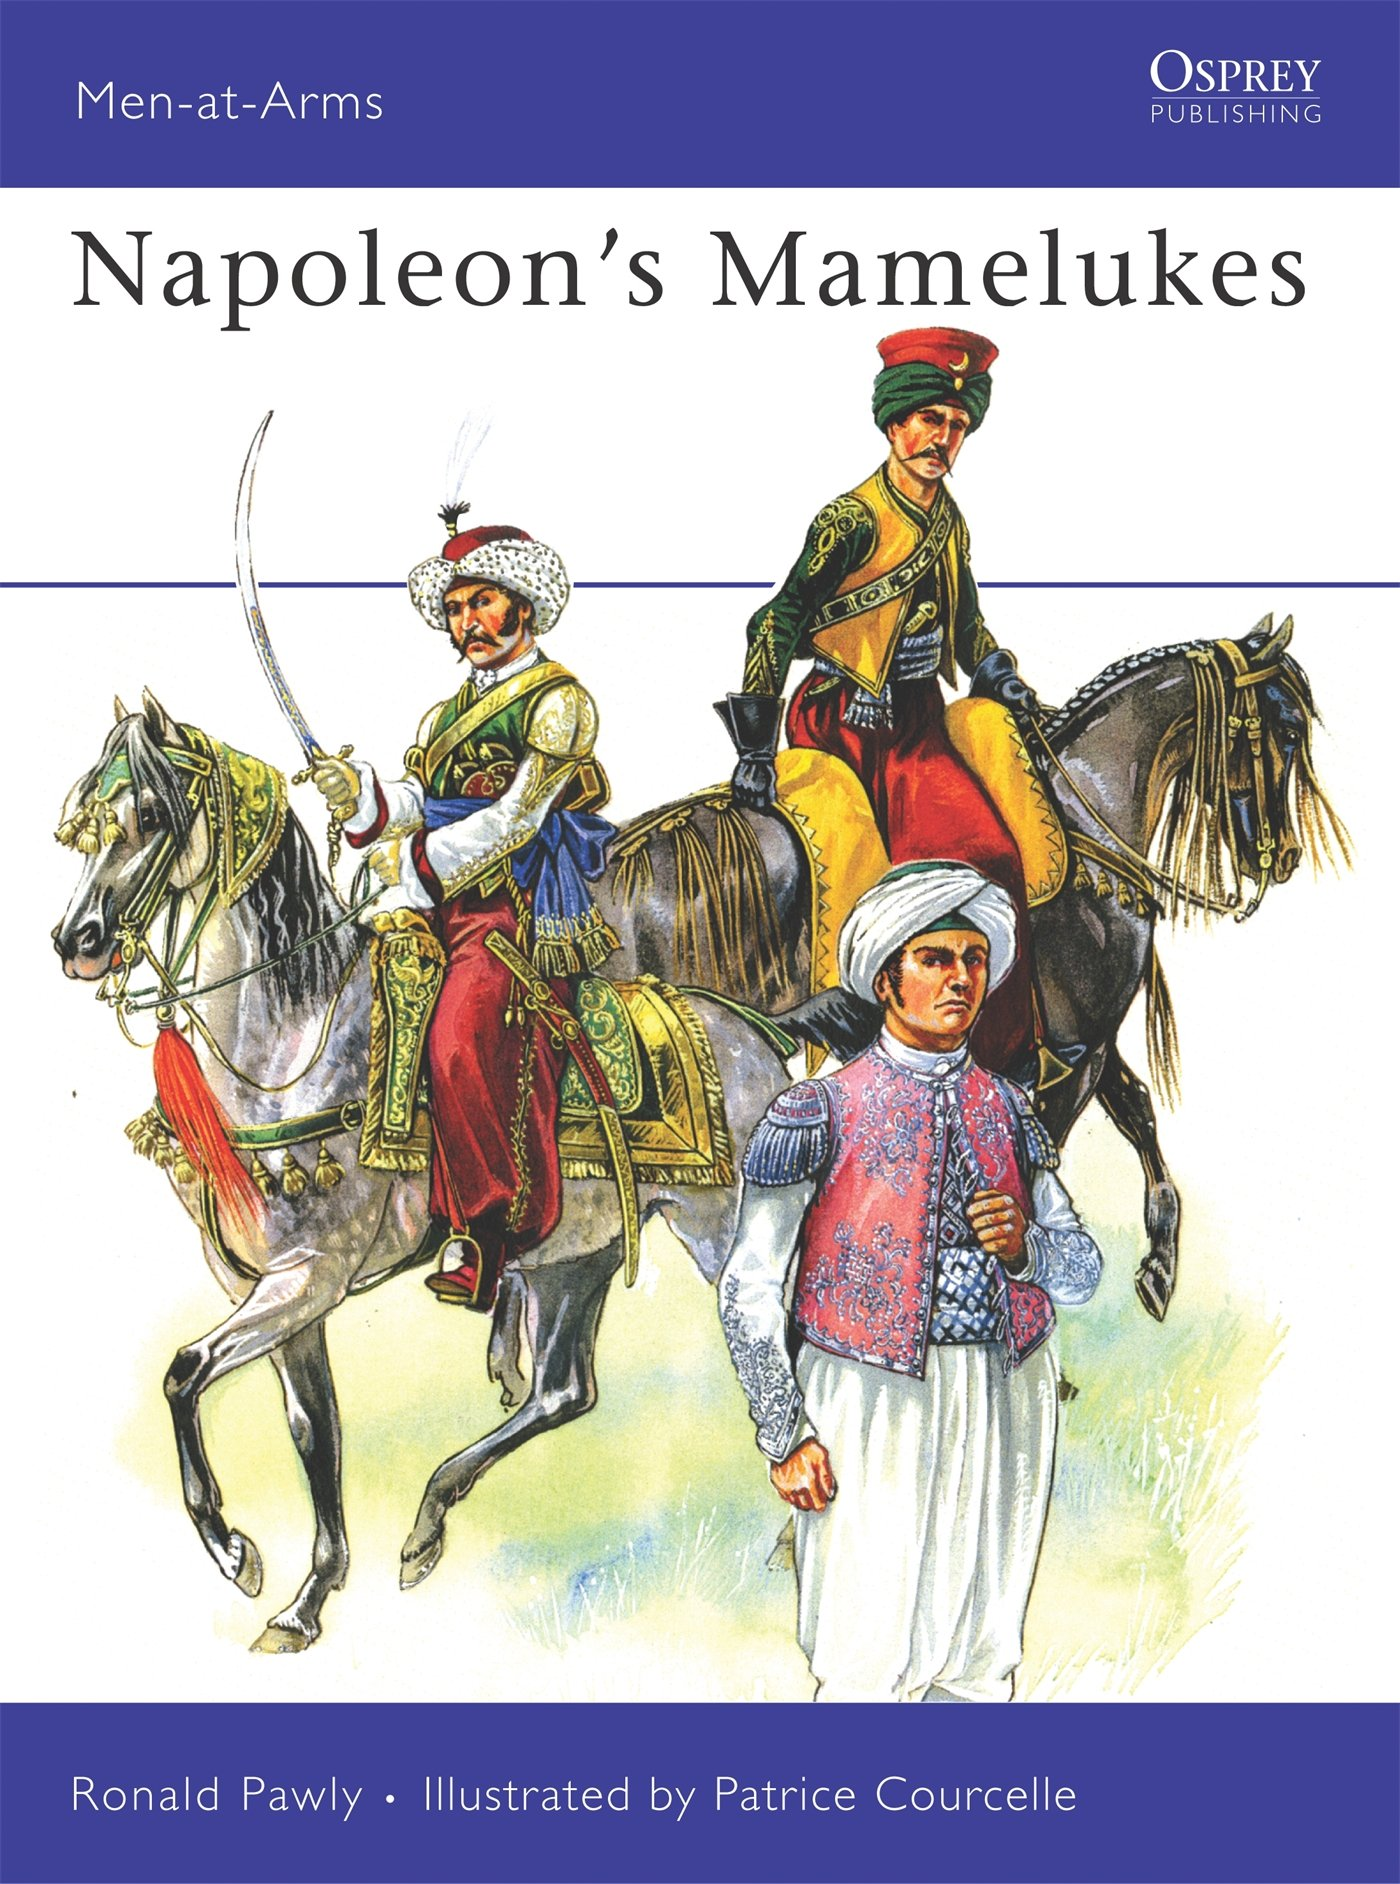 Napoleon's Mamelukes (Men-at-Arms Band 429)